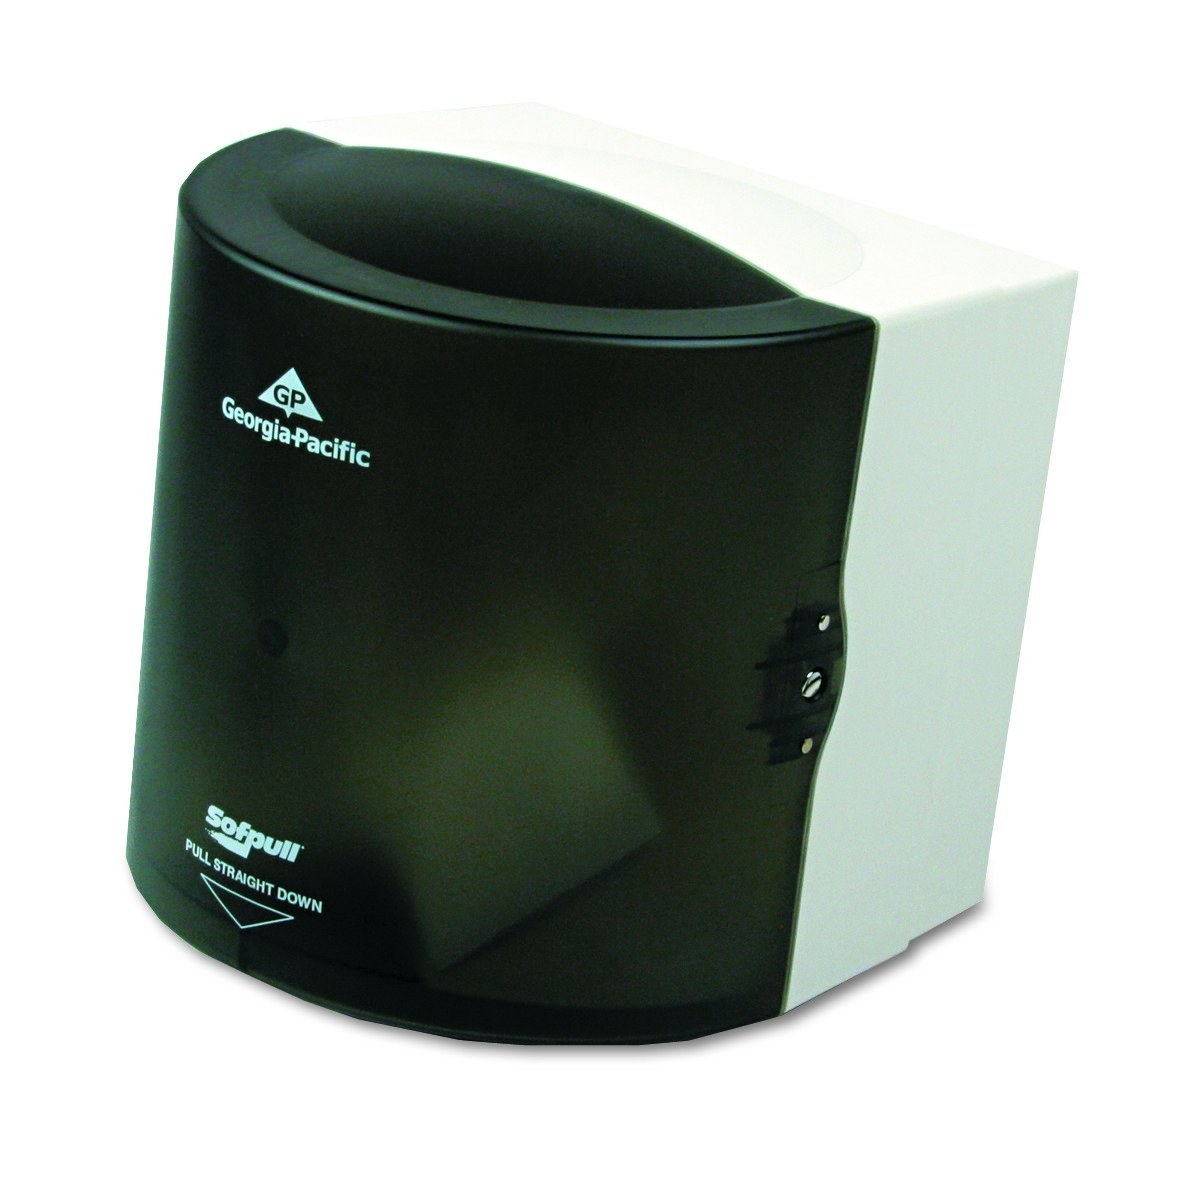 Georgia Pacific Professional 58201 Center Pull Hand Towel Dispenser, 10 7/8w x 10 3/8d x 11 1/2h, Smoke